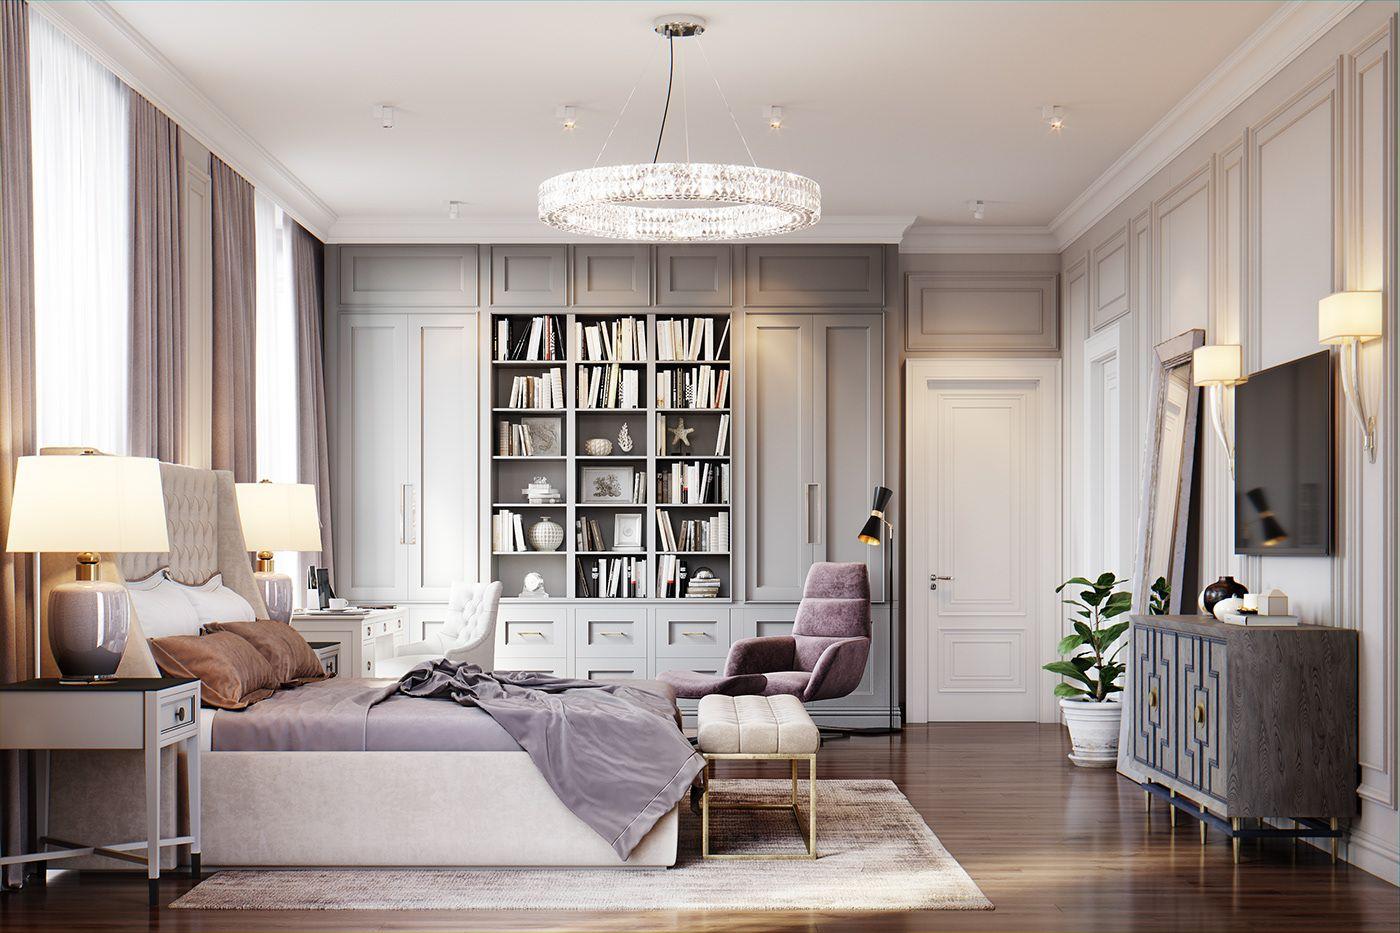 Bedroom And Children Room On Behance Classic Bedroom Room Interior Architecture Design Classic bedroom for children